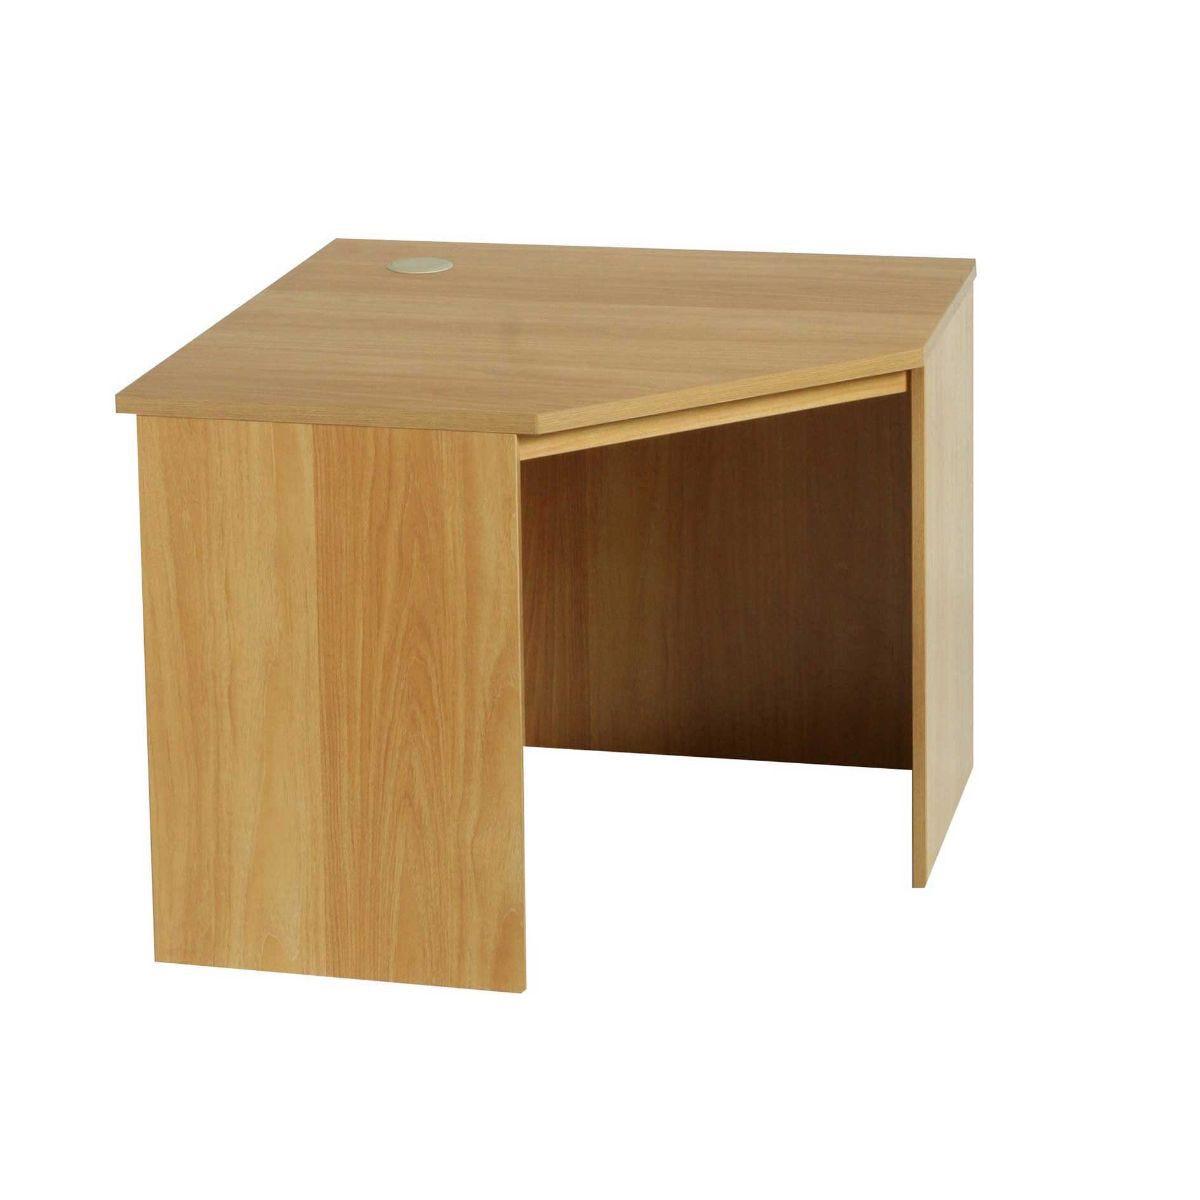 Modular Office Furniture Desks Furniture Storage Ryman